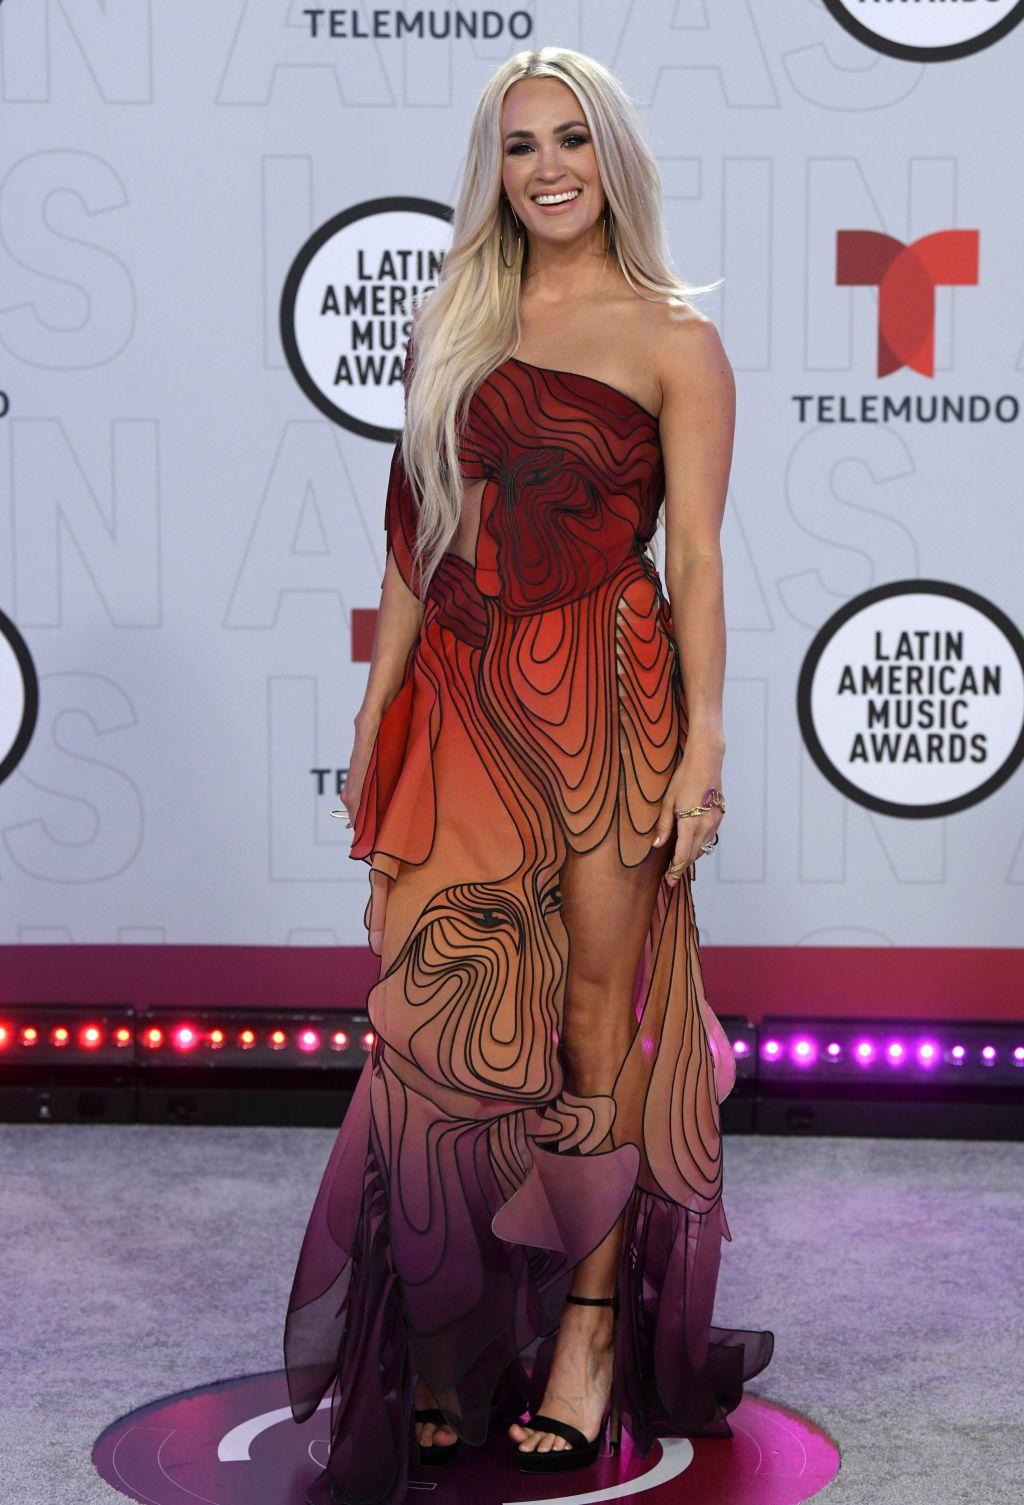 carrie underwood latin american music awards